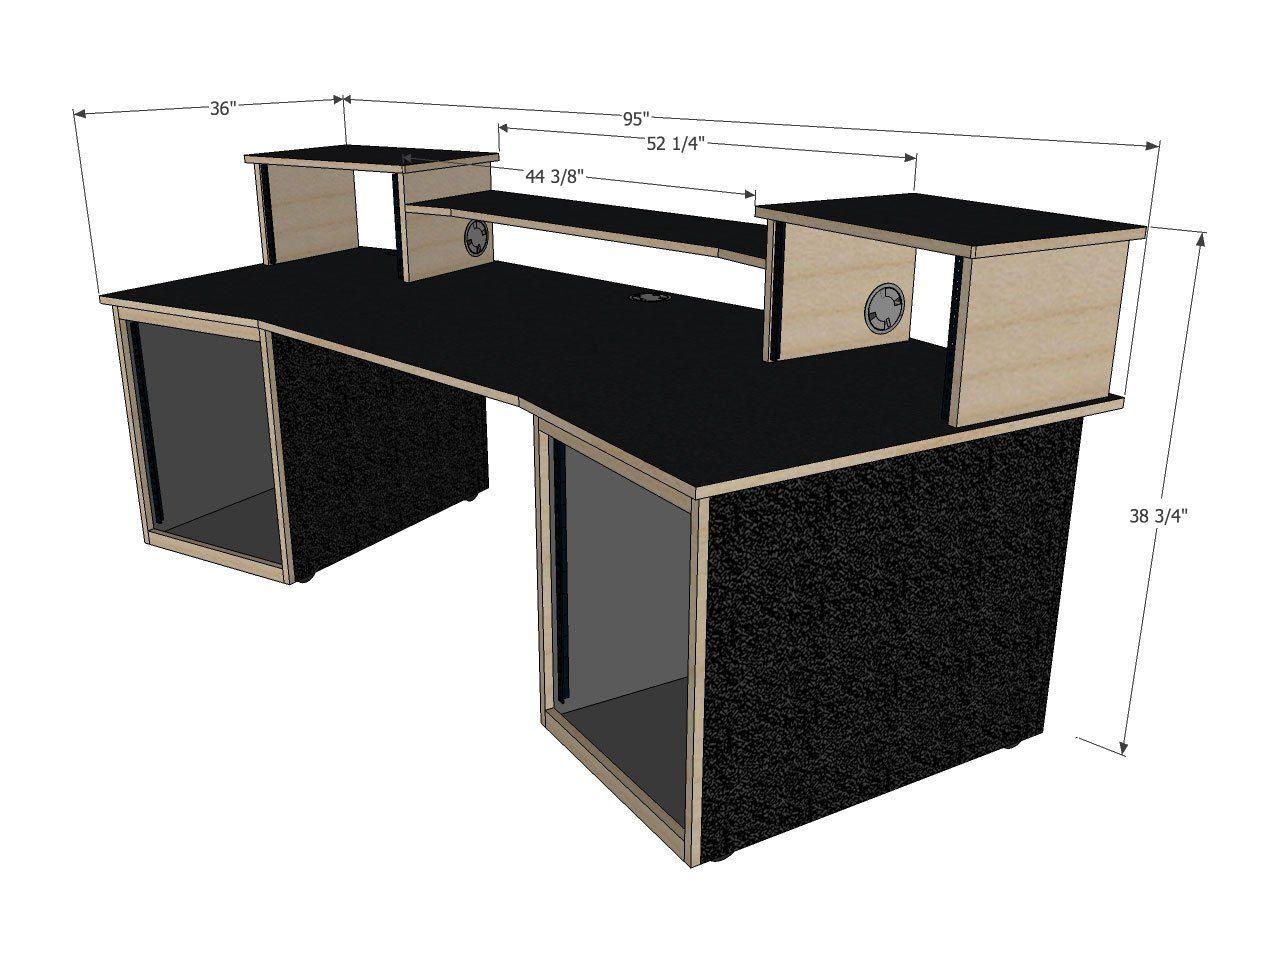 scs digistation recording studio desks studio desk concepts recording studio desk studio. Black Bedroom Furniture Sets. Home Design Ideas